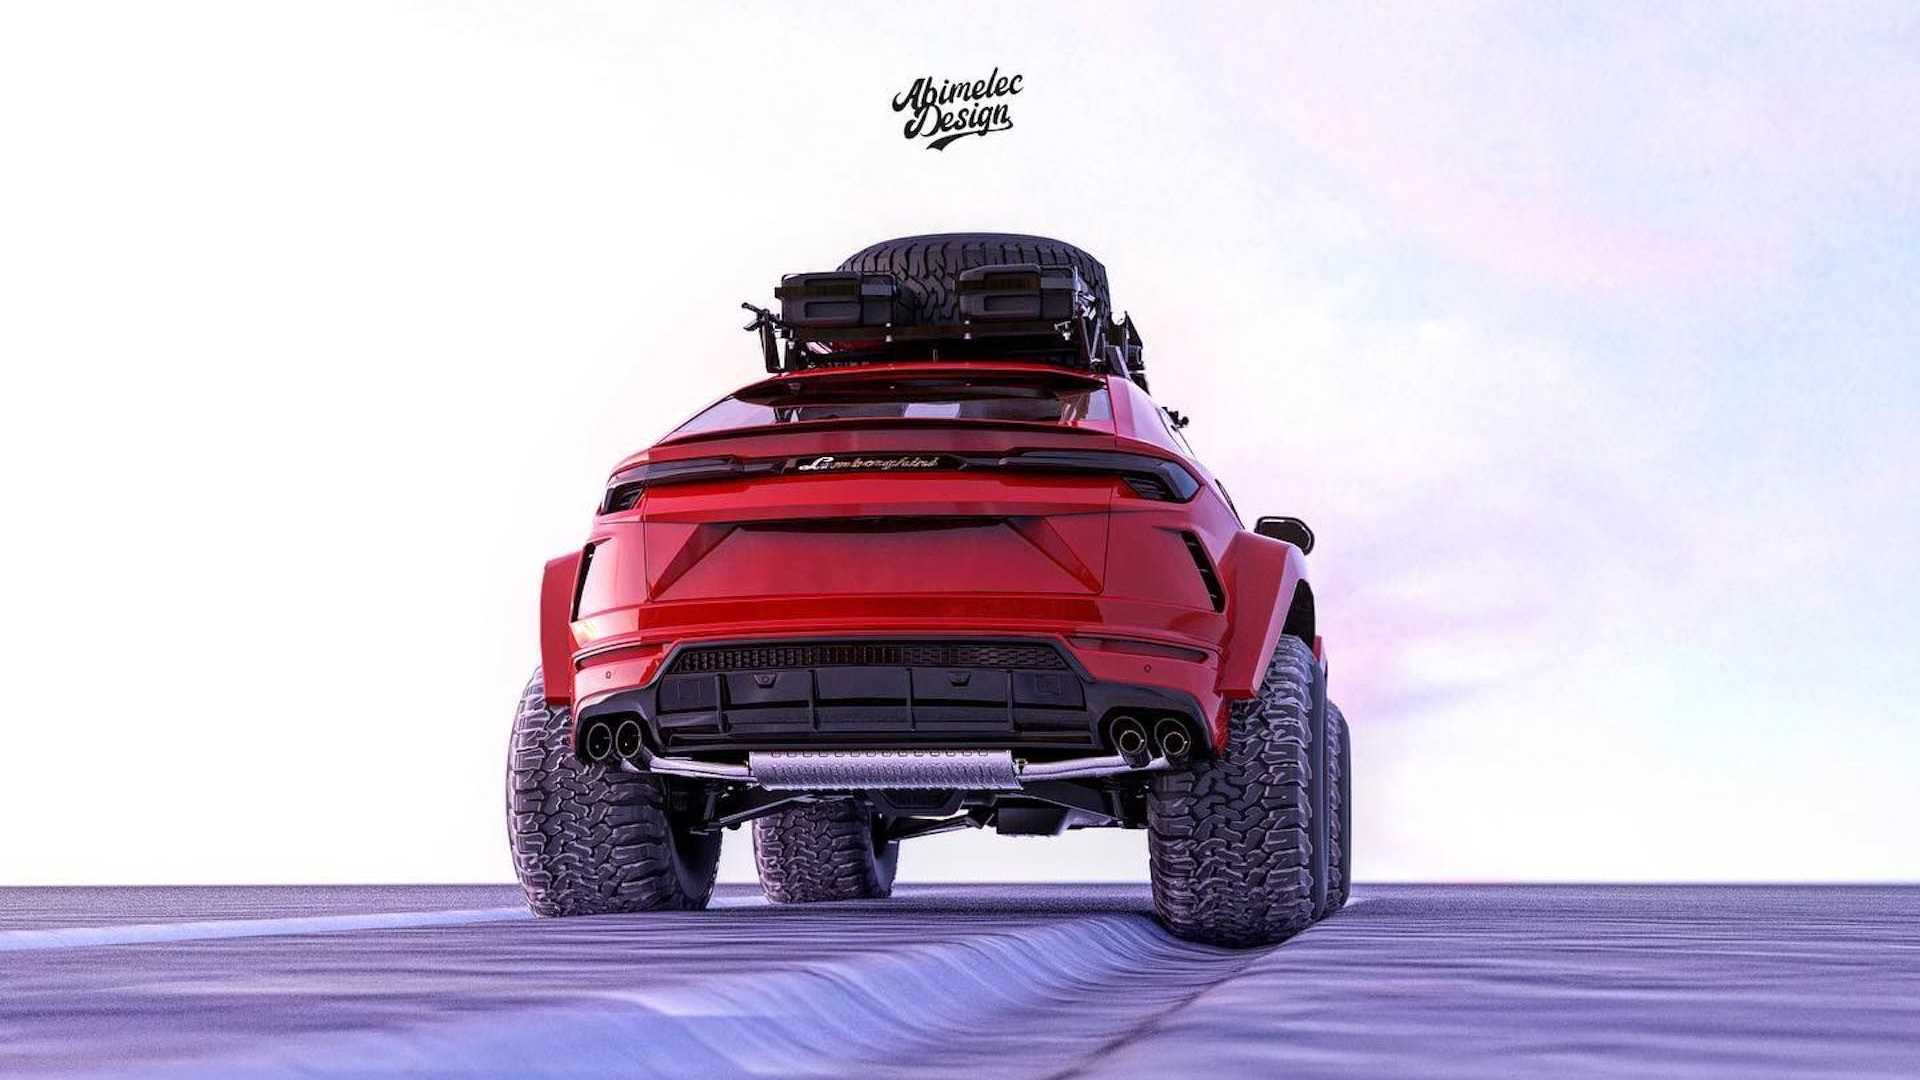 Lamborghini Urus Off-Roader Rendering by Abimelec Design